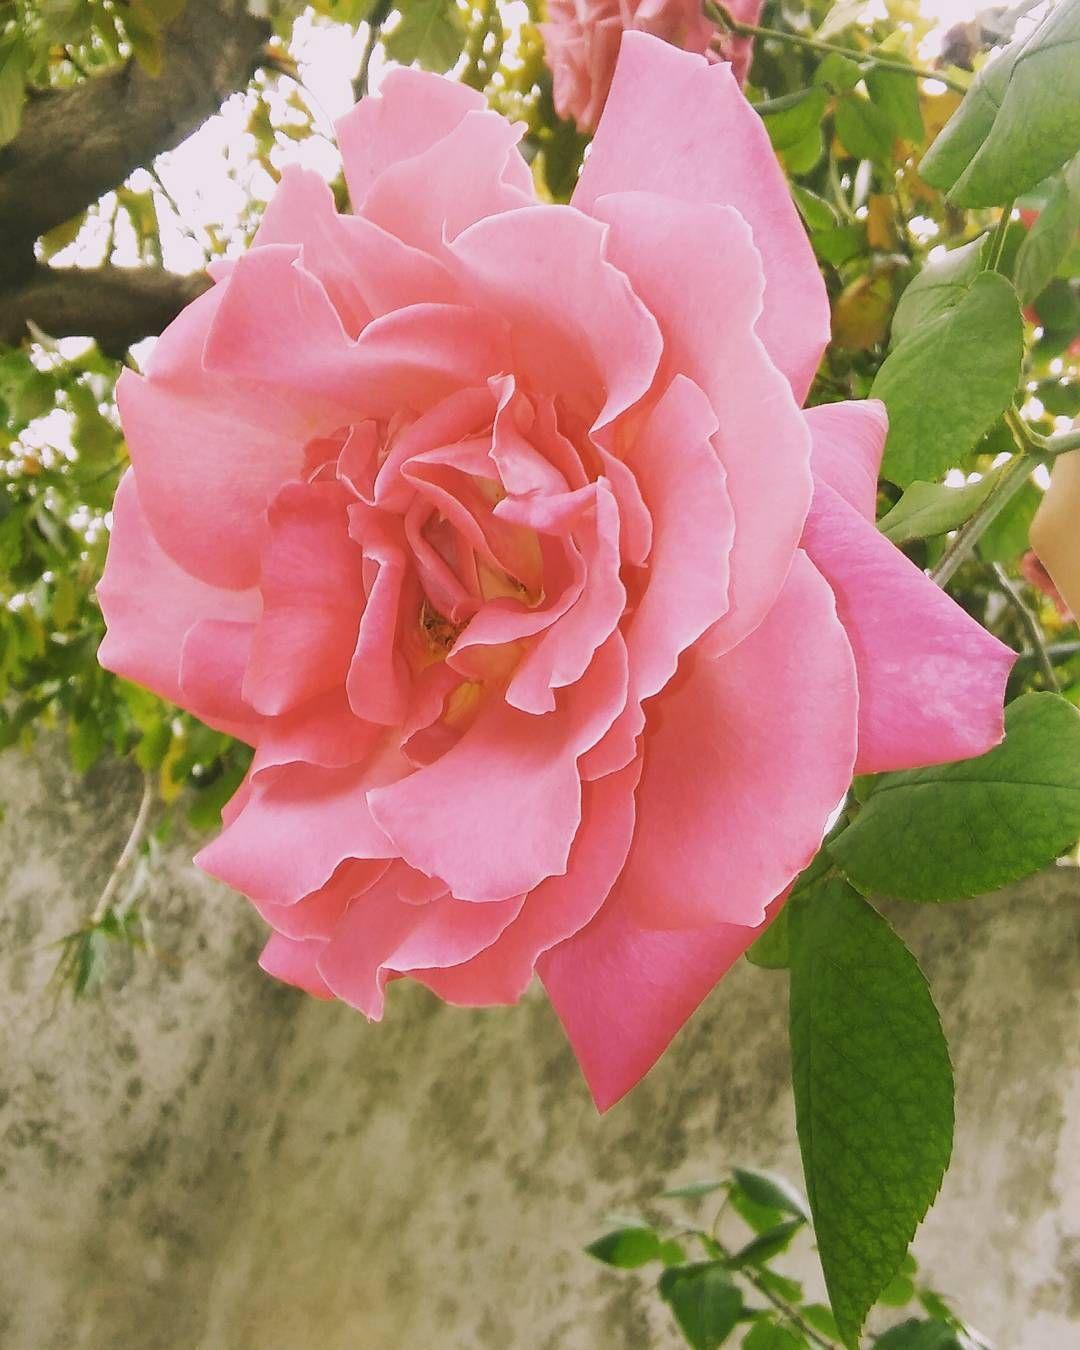 Grunge Naturaleza Rosa Rose Photography Green Flowers Pink Girls Arte Tumblr Nature Animal Fauna Flores Farm Garden